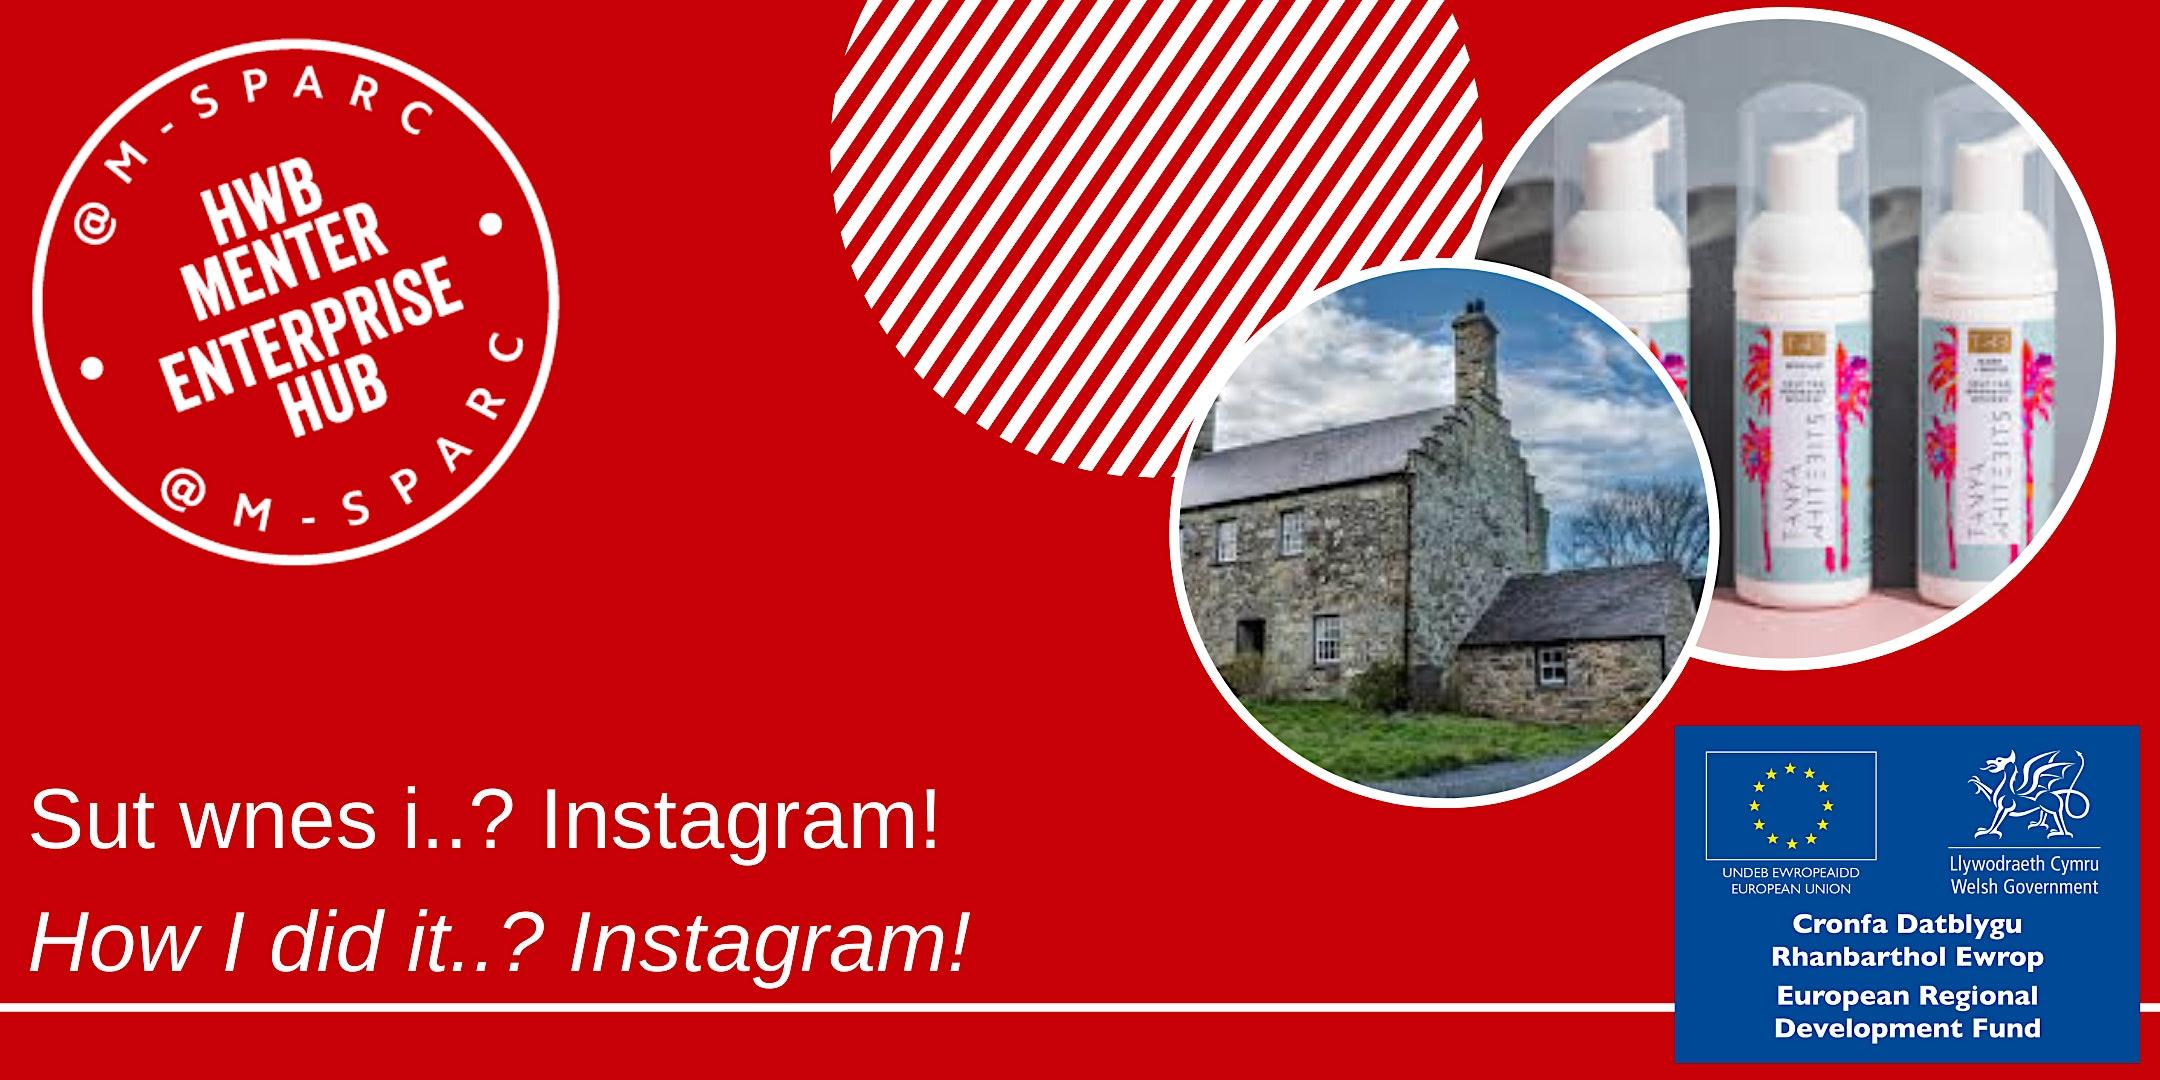 Covid-19: Sut wnes i...Instagram!  / How I did it...Instagram!